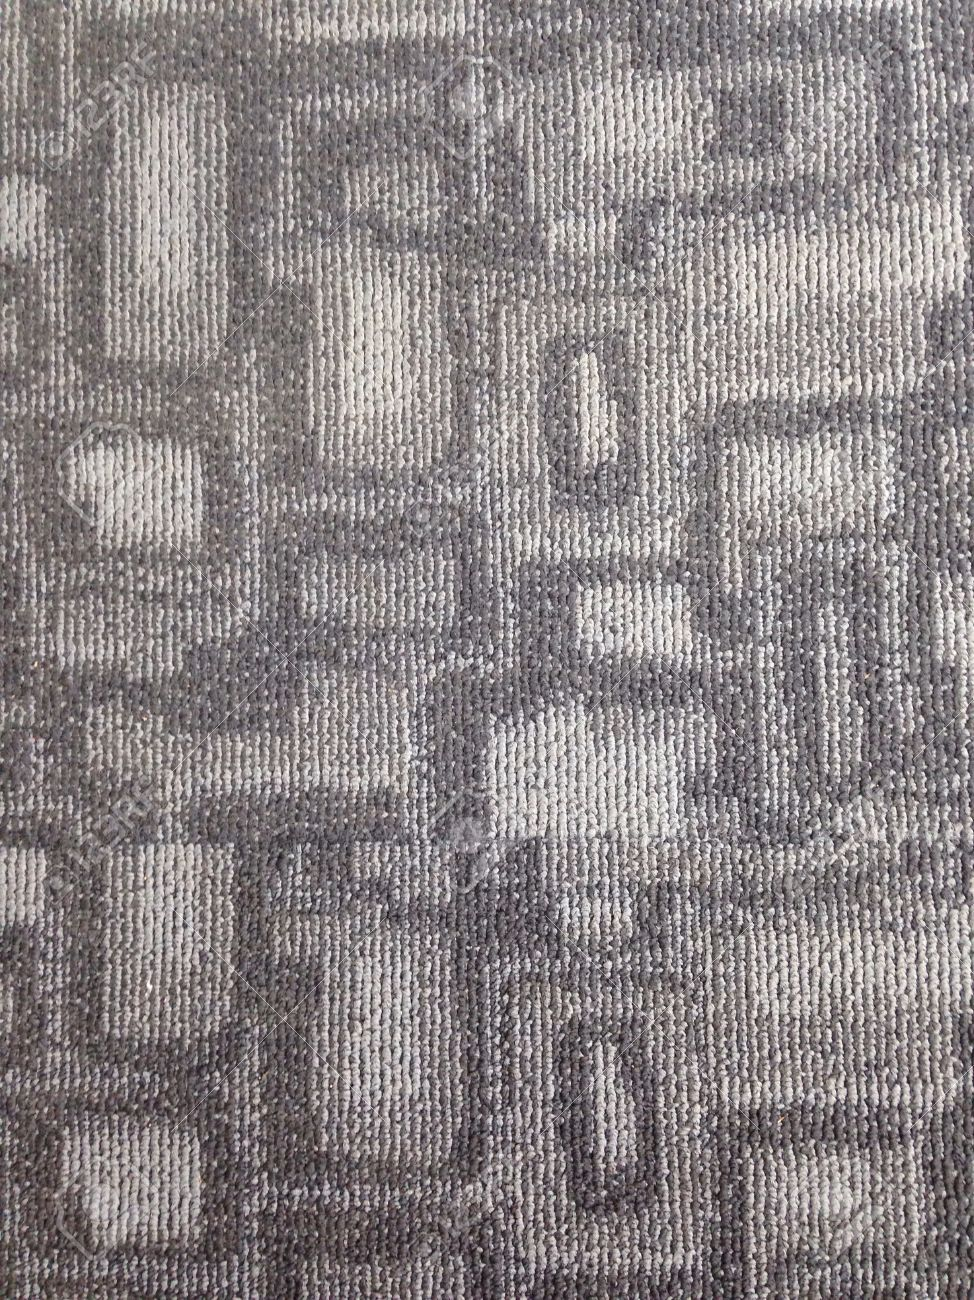 gray carpet texture stock photo 22740366